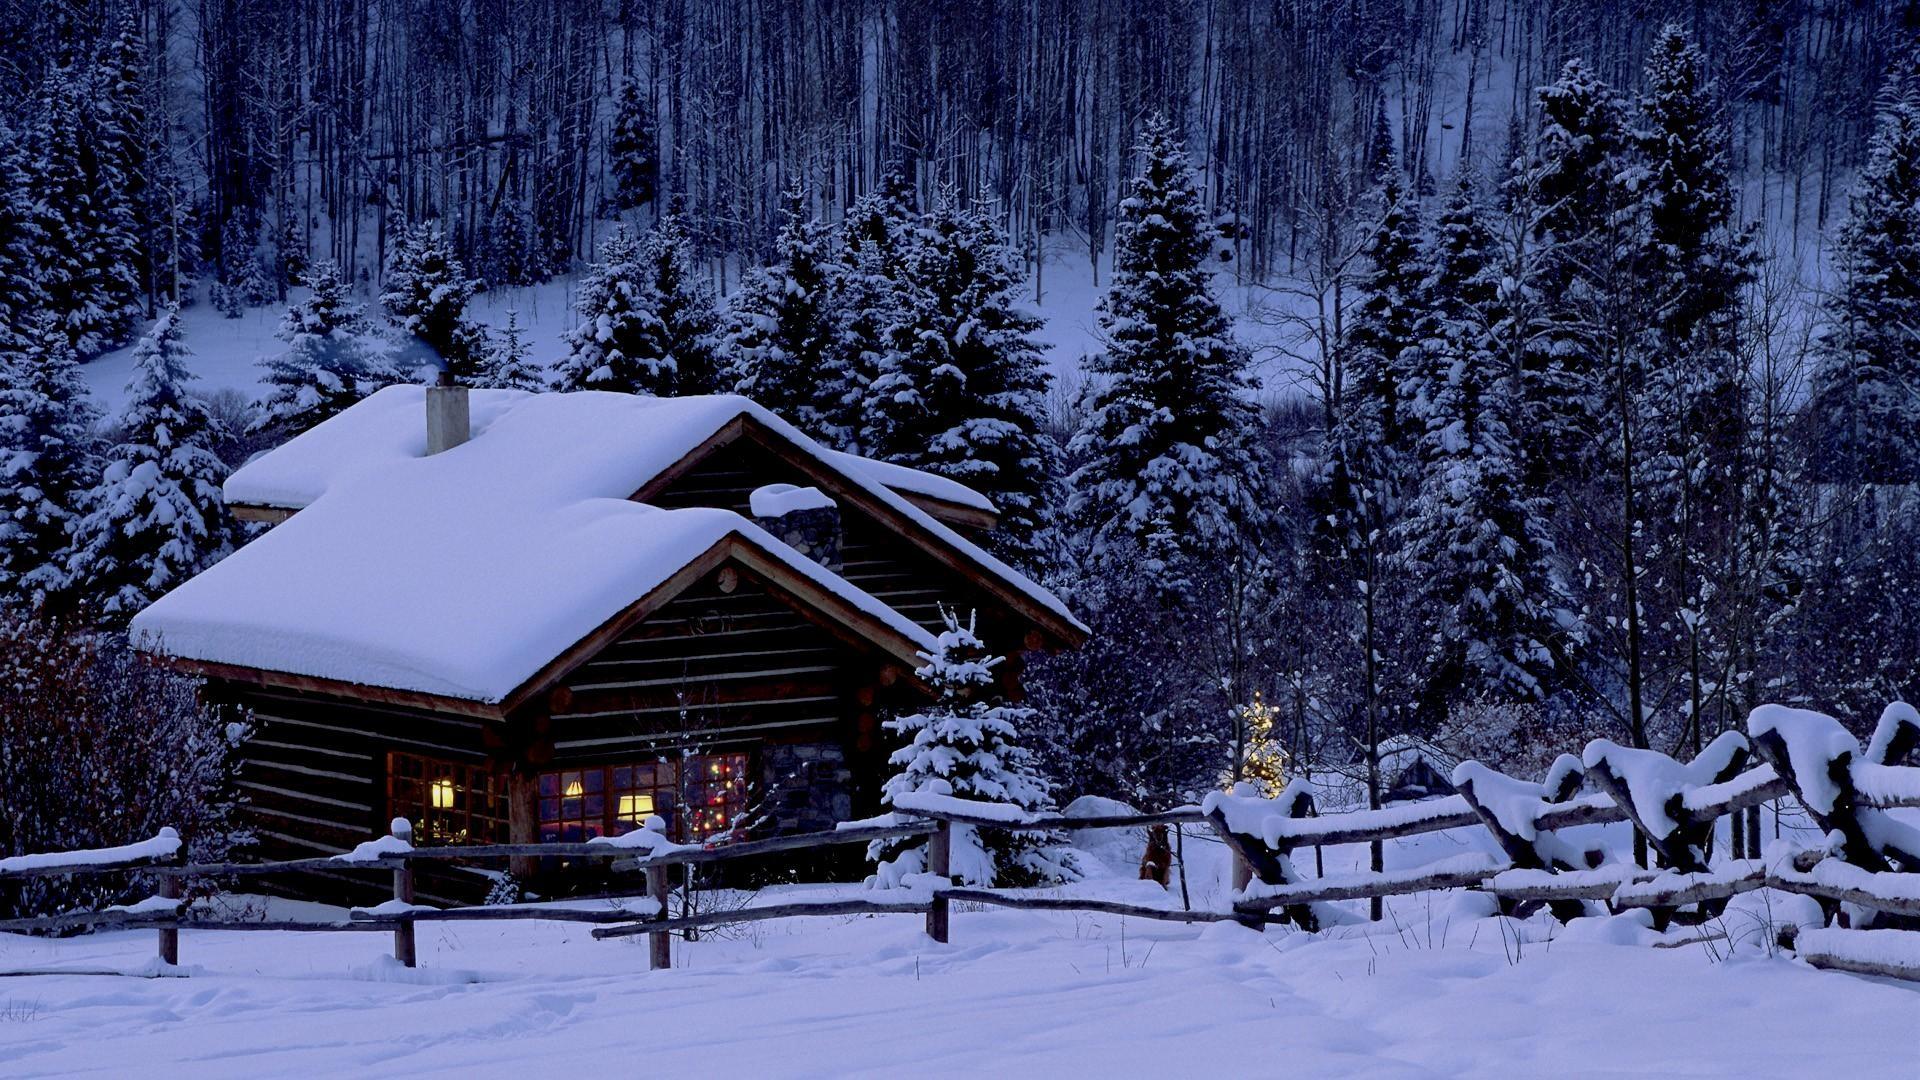 фото с домом в лесу